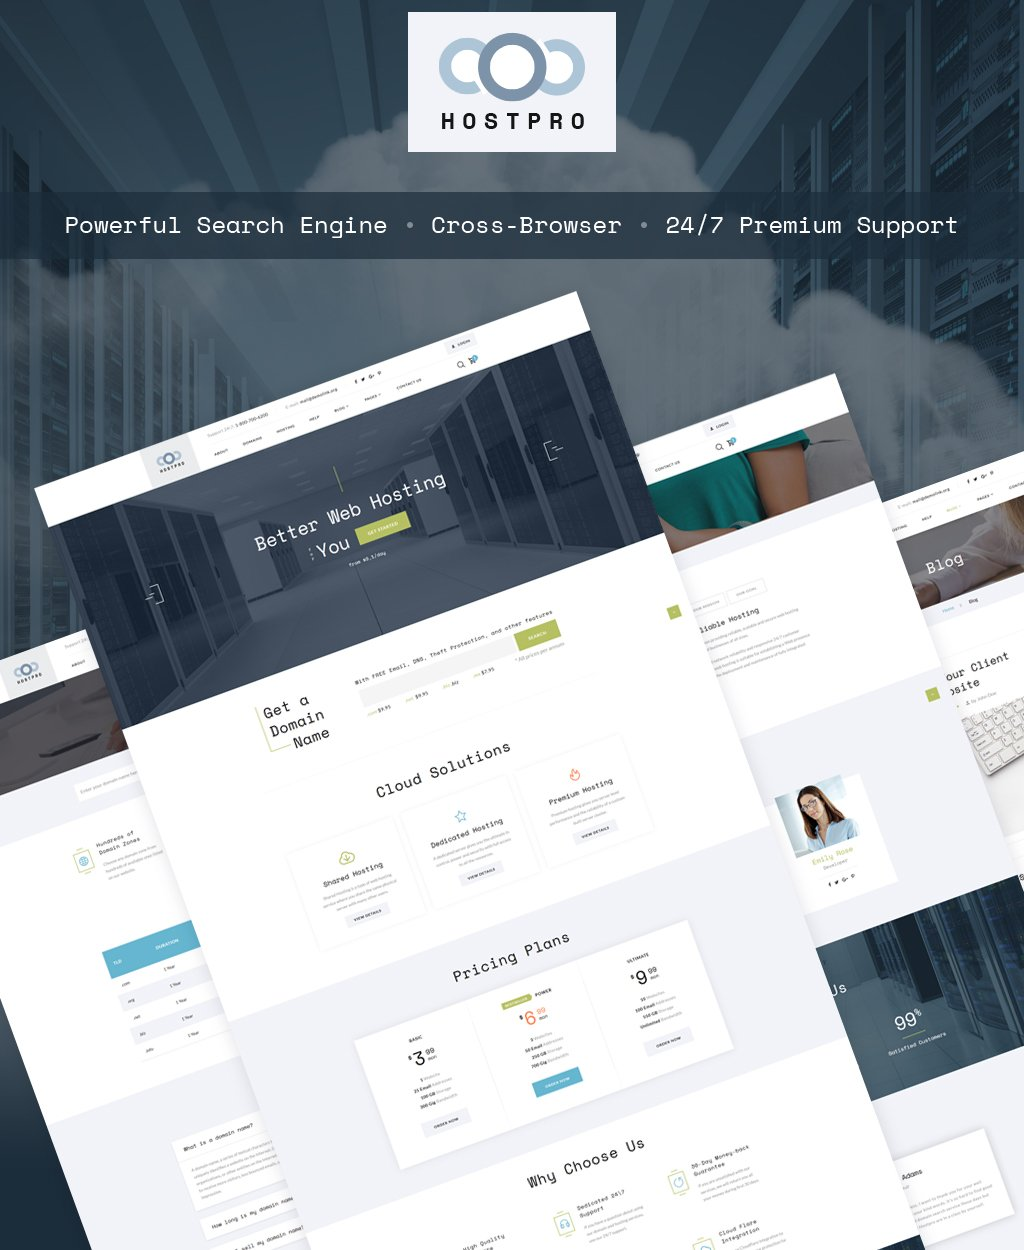 Hostpro - Domain and Hosting HTML Website Template - screenshot